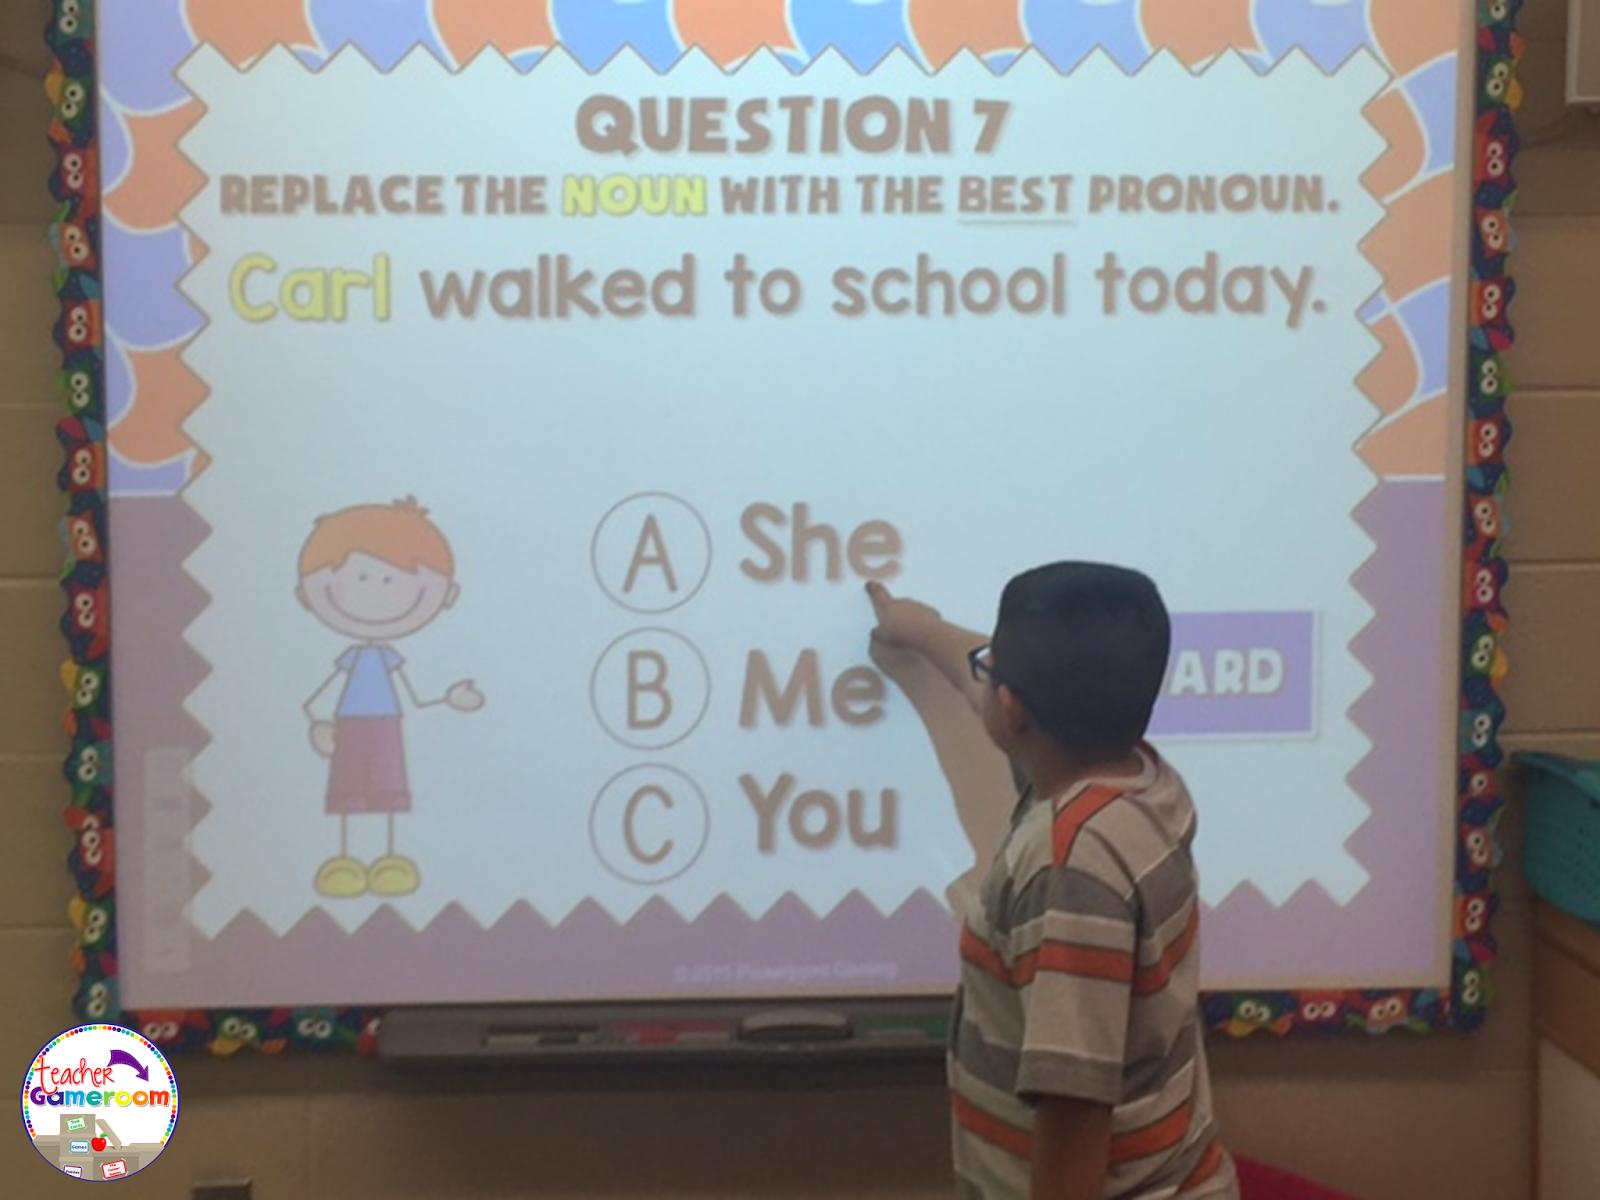 Teacher Gameroom Replacing Nouns With Pronouns